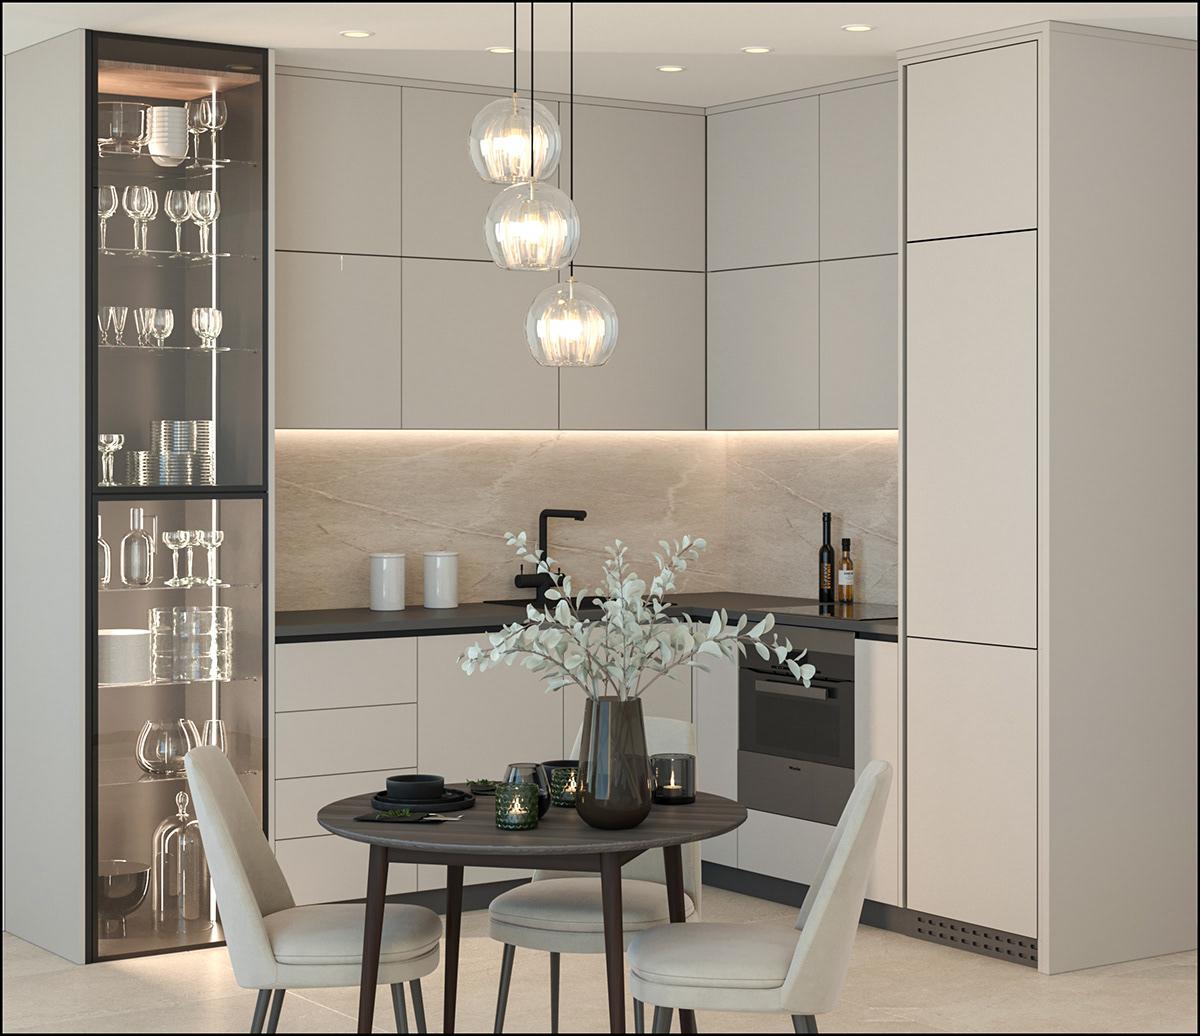 apartment design apartment interior design interior design  Minimalism дизайн интерьера Дизайн квартиры Интерьер квартиры минимализм современный интерьер